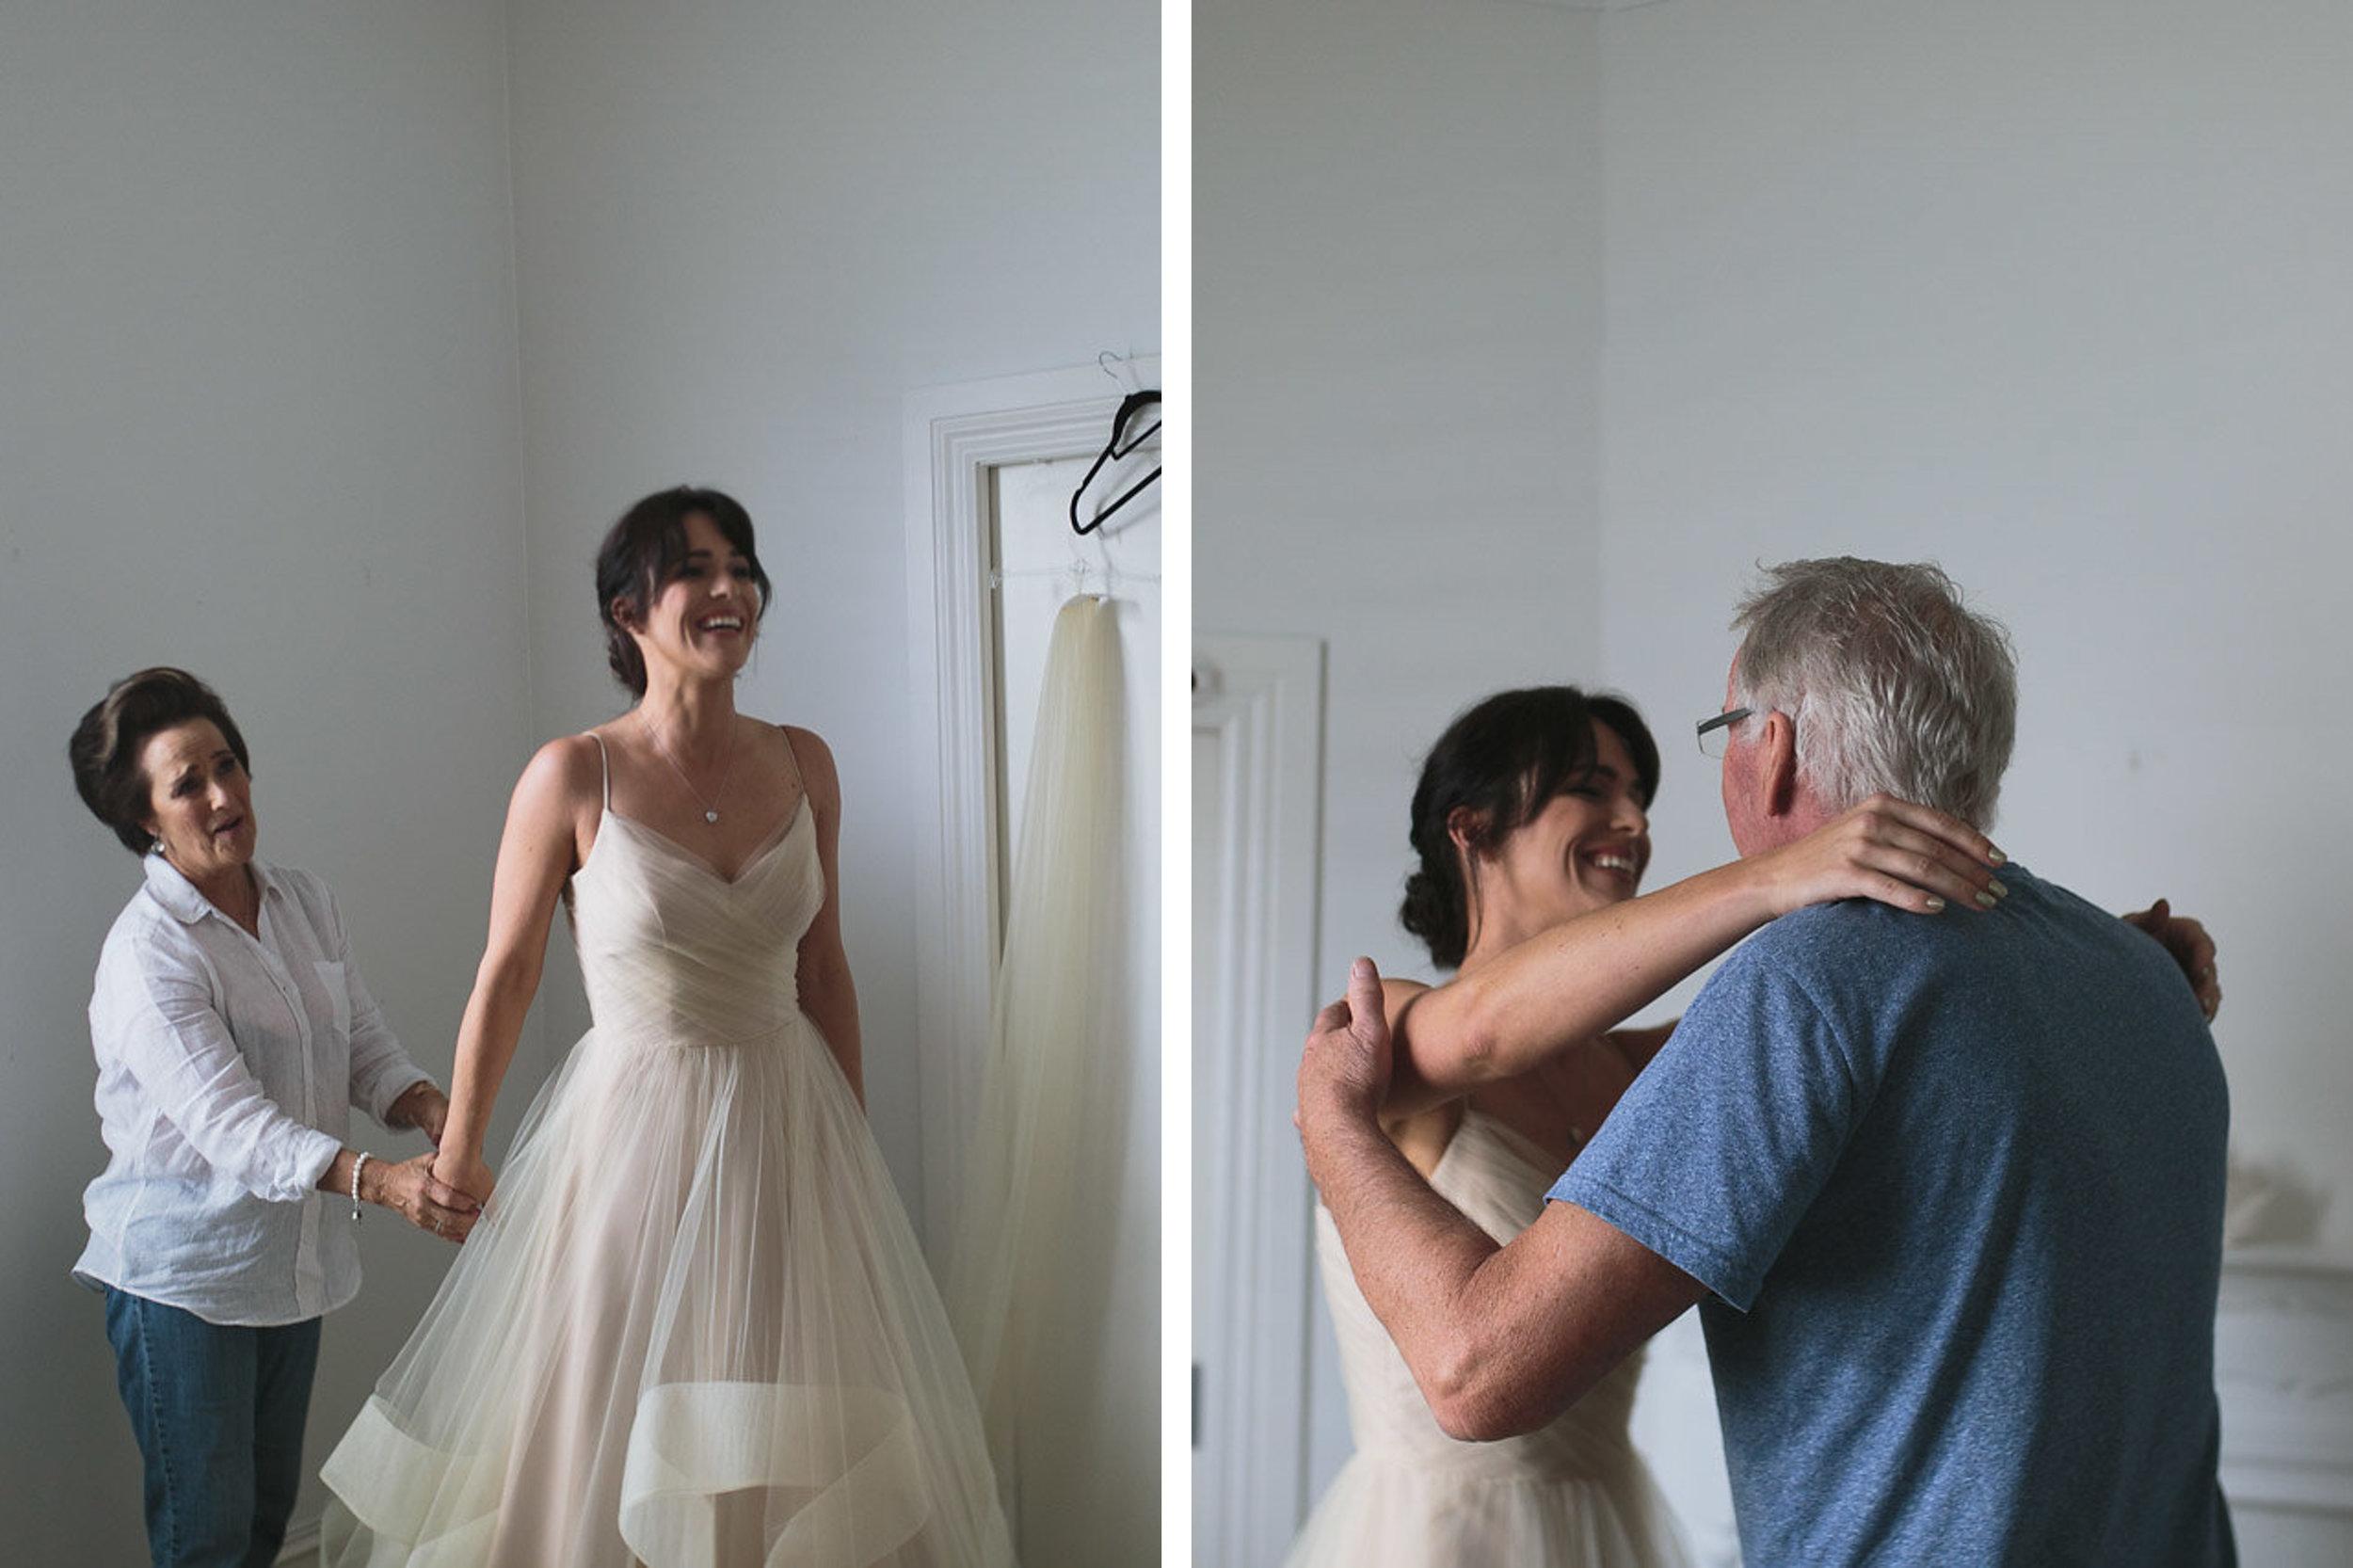 light-and-arrows-auckland-urban-wedding-blog-31.jpg